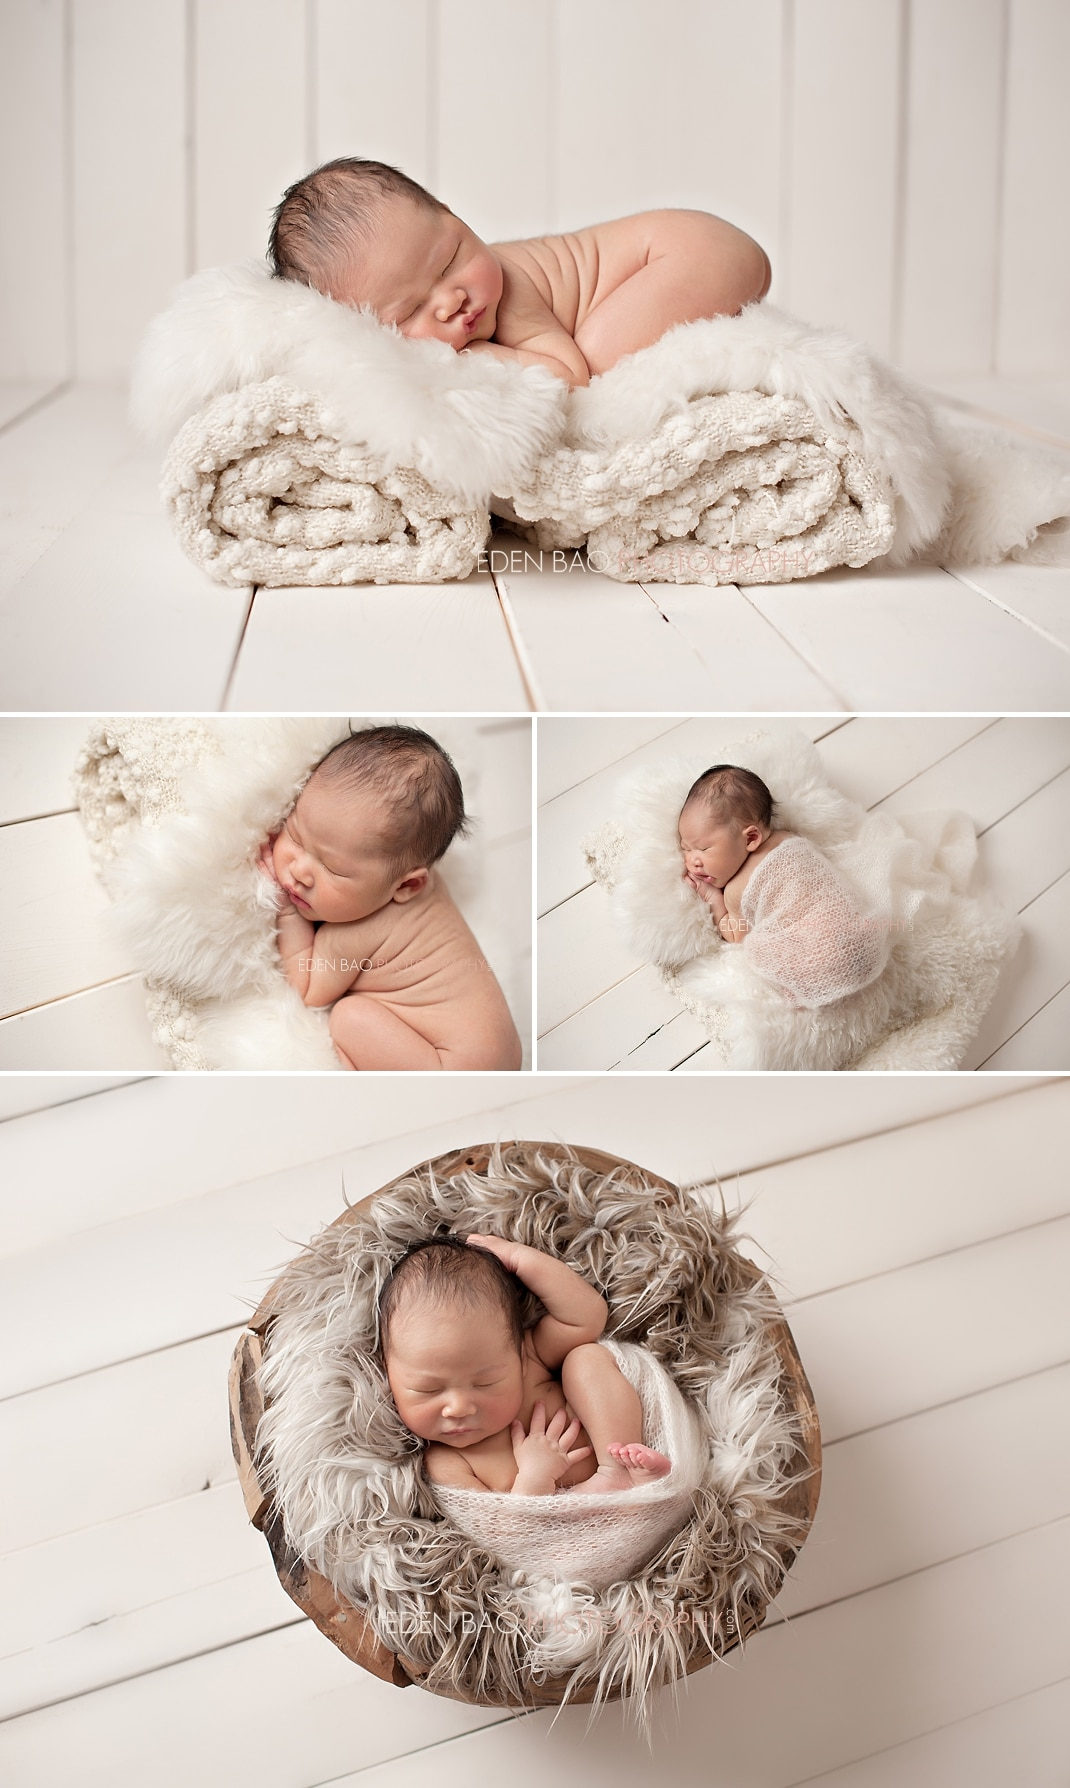 Vancouver BC Newborn Photographer Eden Bao | Newborn boy cream tone sheep rug wood plank